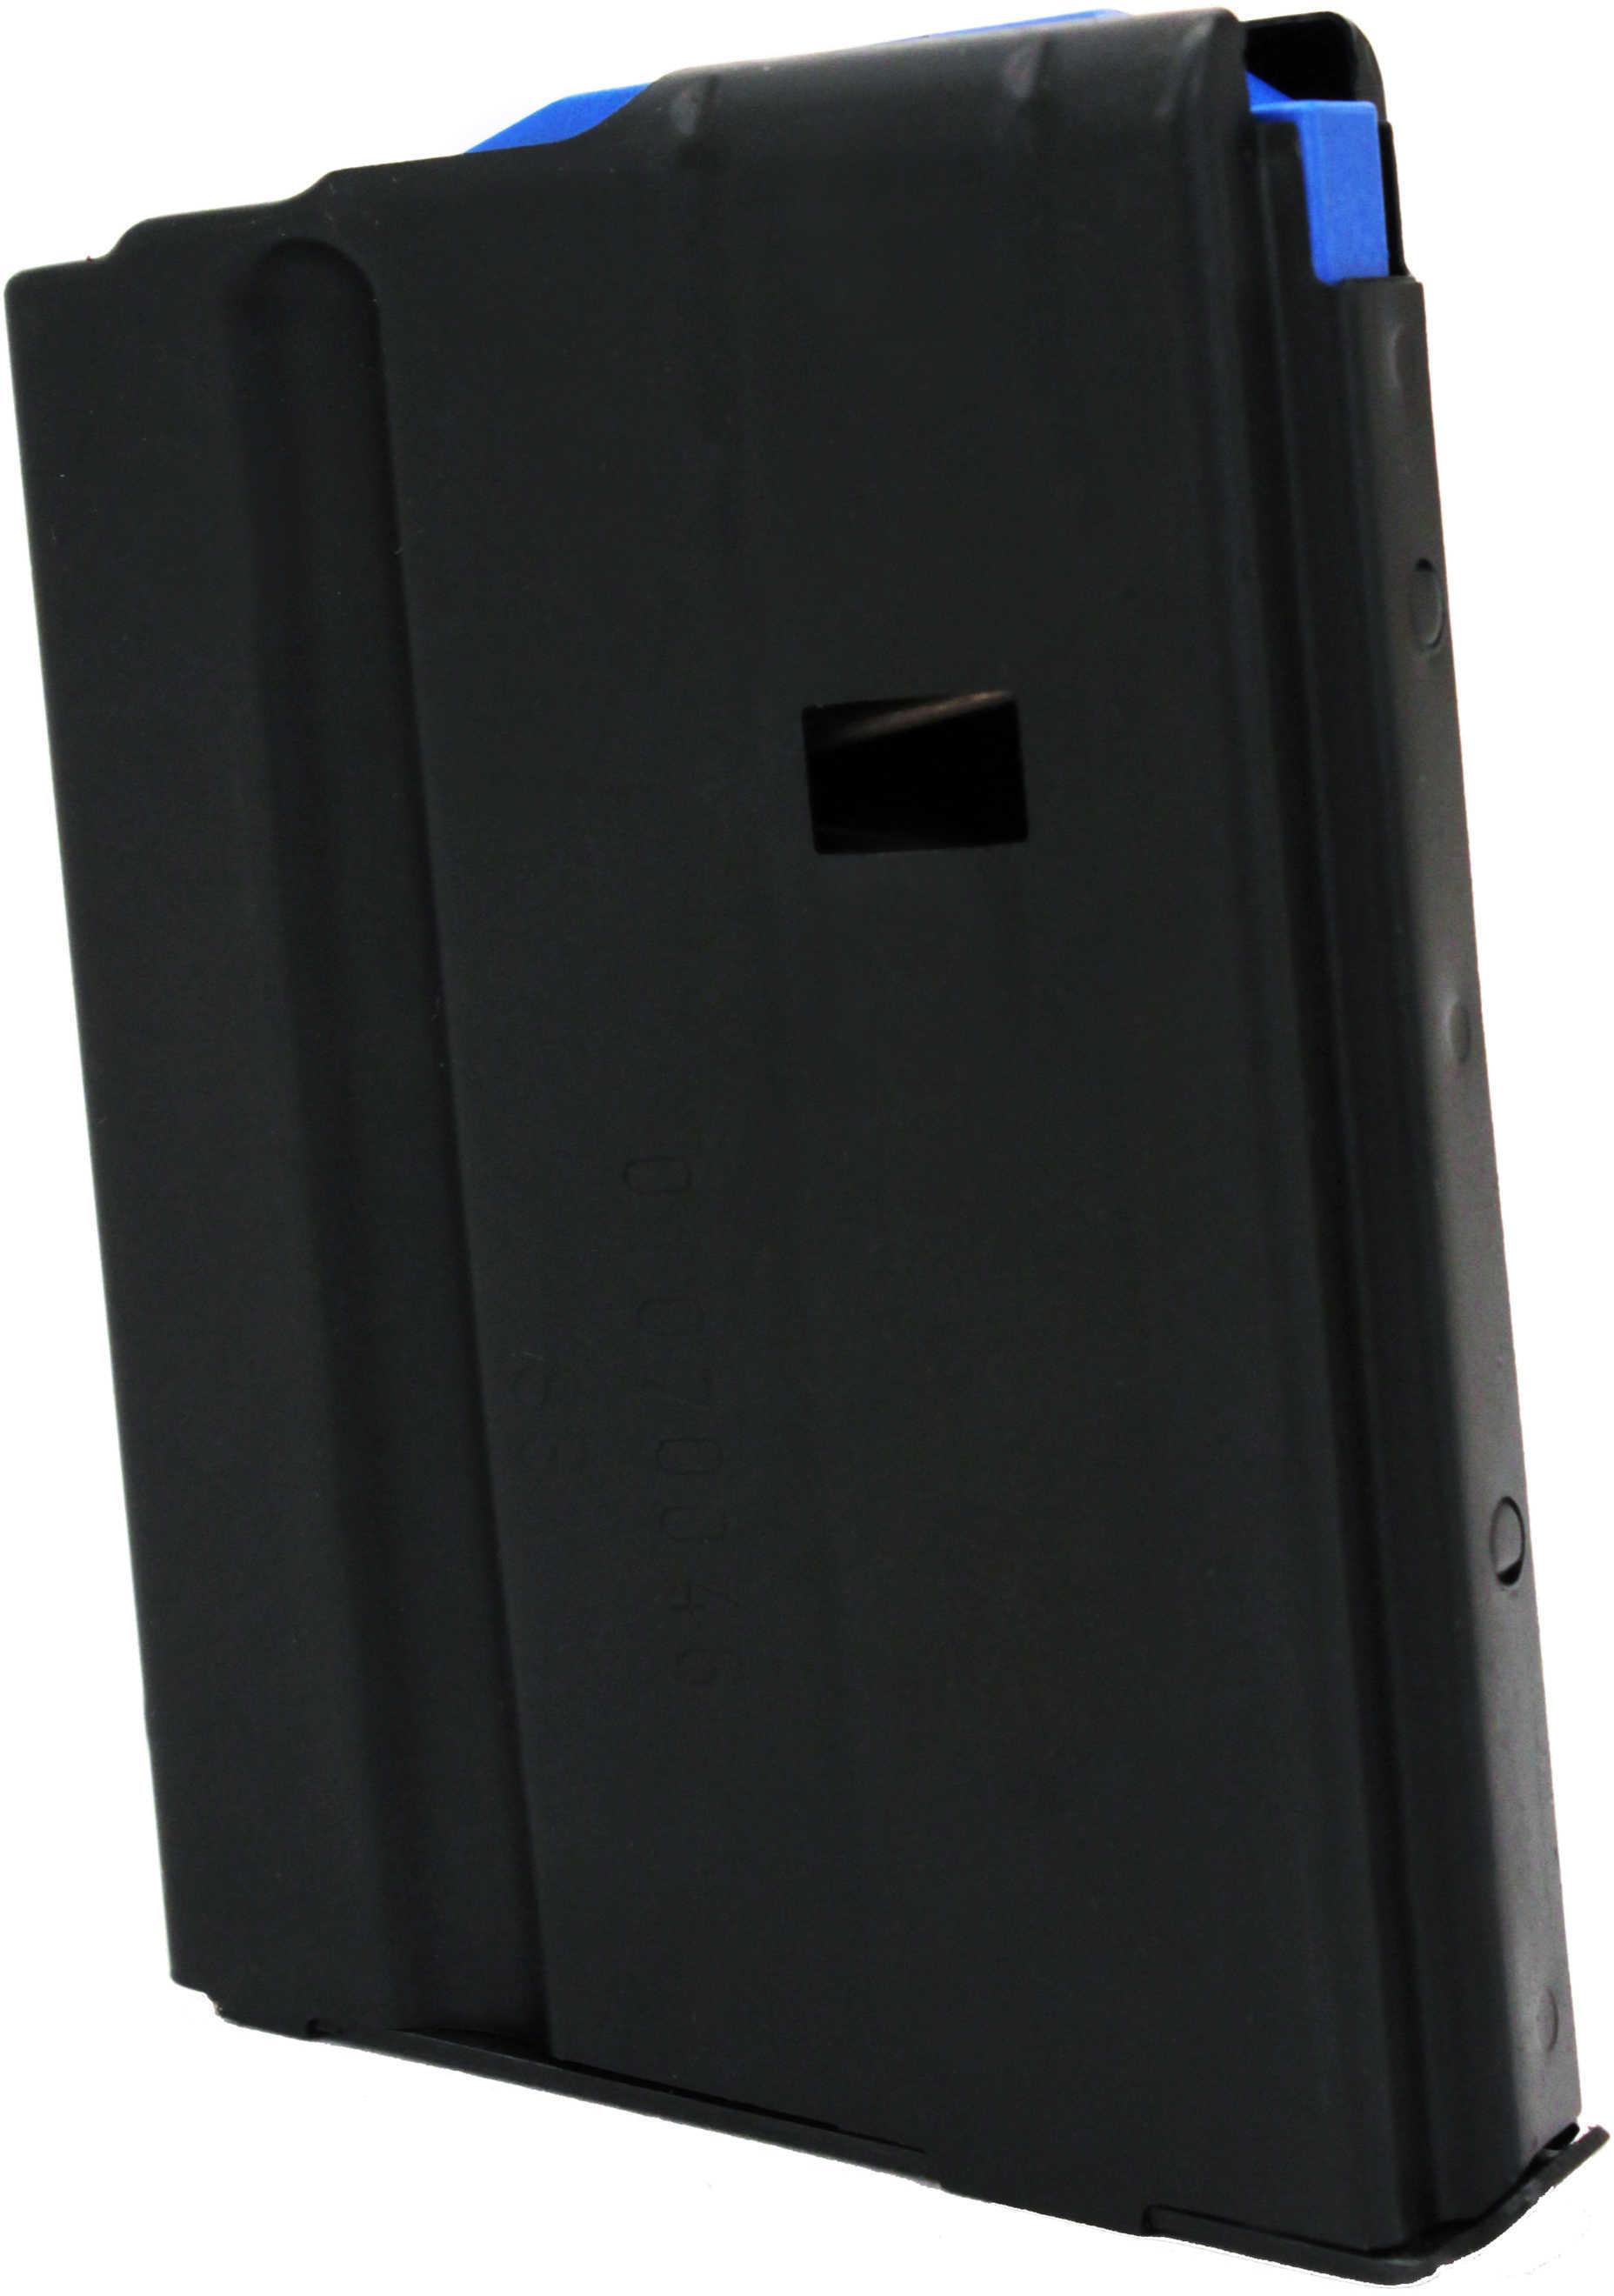 AR-15 Magazine 6.5mm Stainless Steel Matte Black/Blue Follower 10 Round Md: 1065041176Cpd